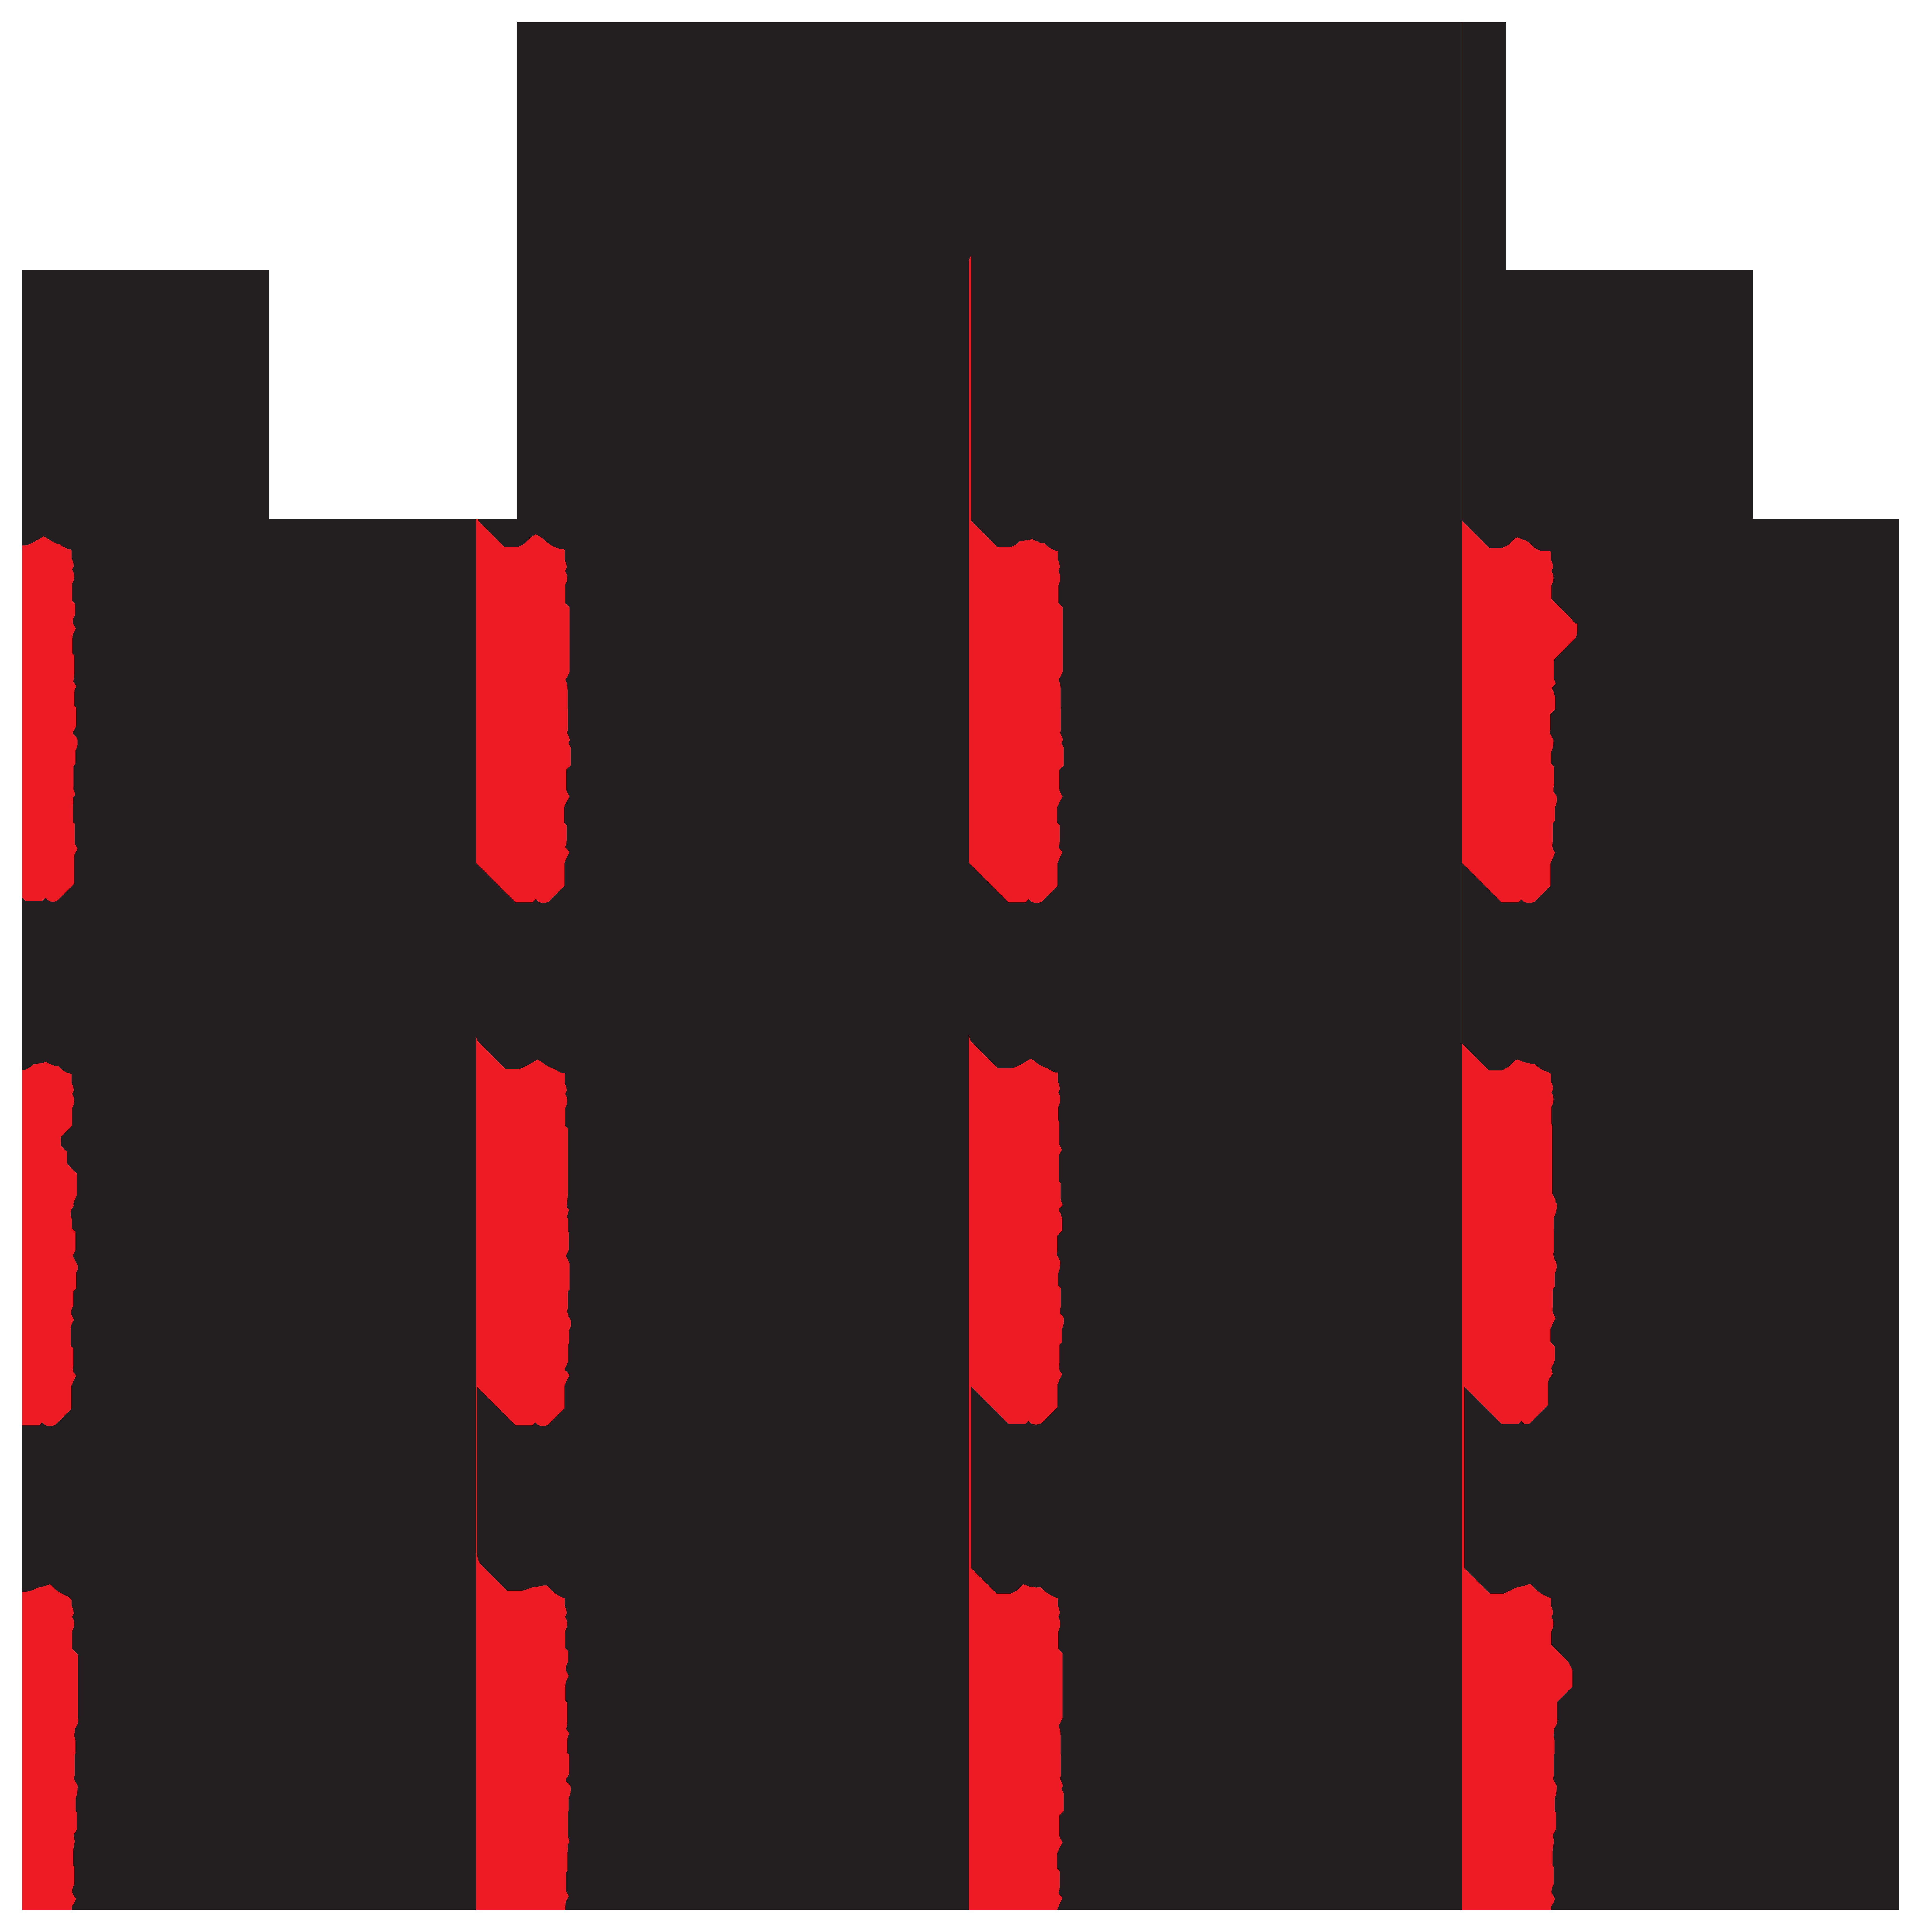 June calendar 2016 clipart graphic black and white library 2017 Calendar Transparent PNG Clip Art Image | PORTFOLIO | Pinterest ... graphic black and white library